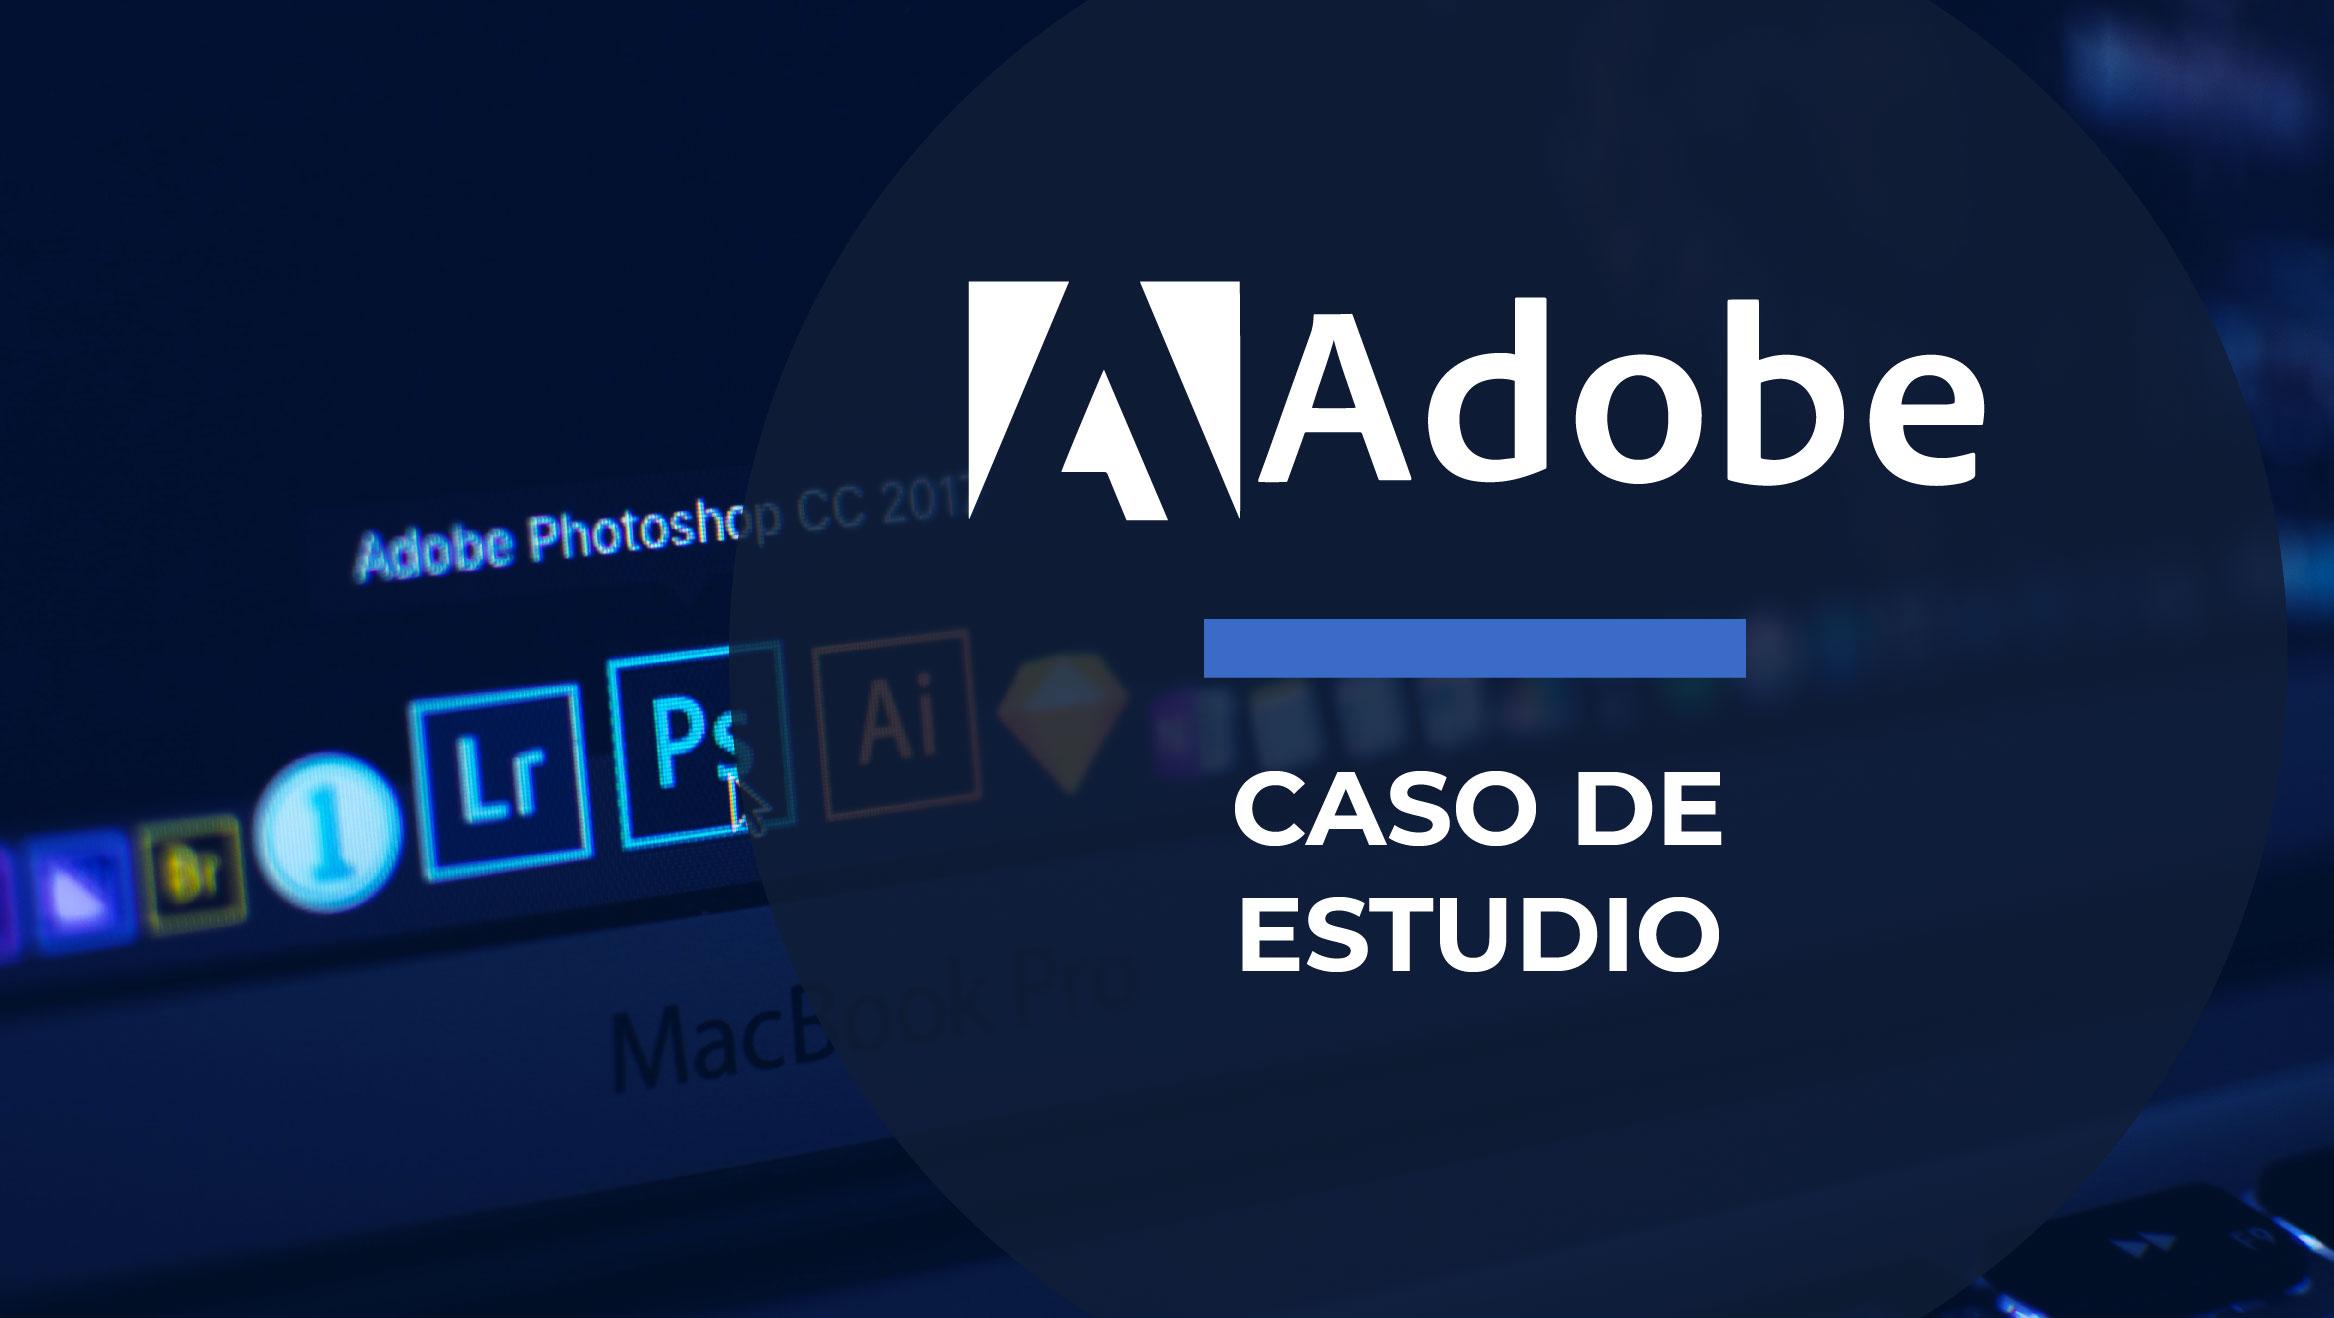 Caso Adobe: Cultura de trabajo colaborativo